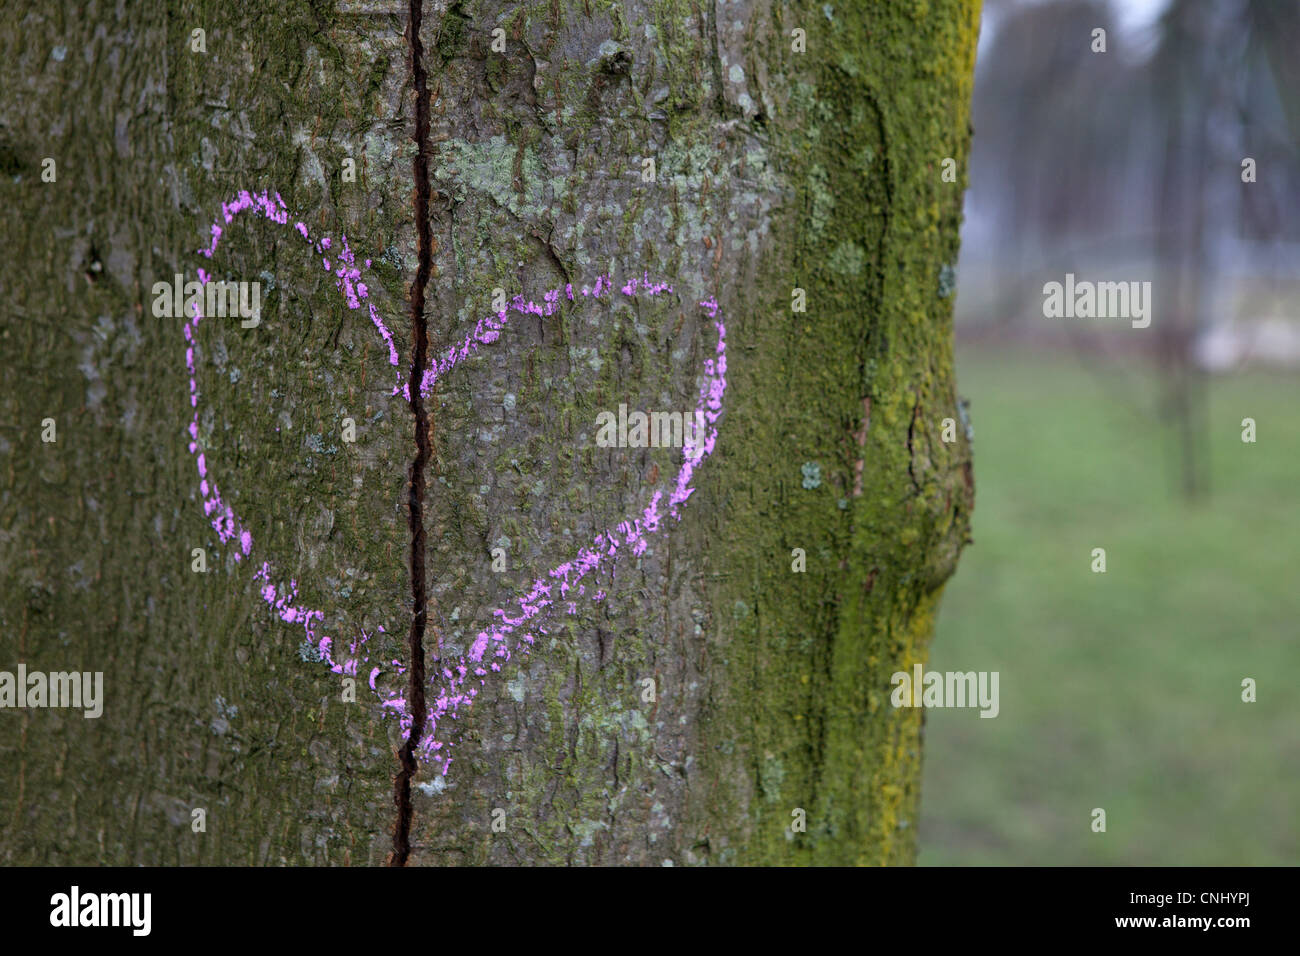 Broken heart drawn on a tree trunk - Stock Image